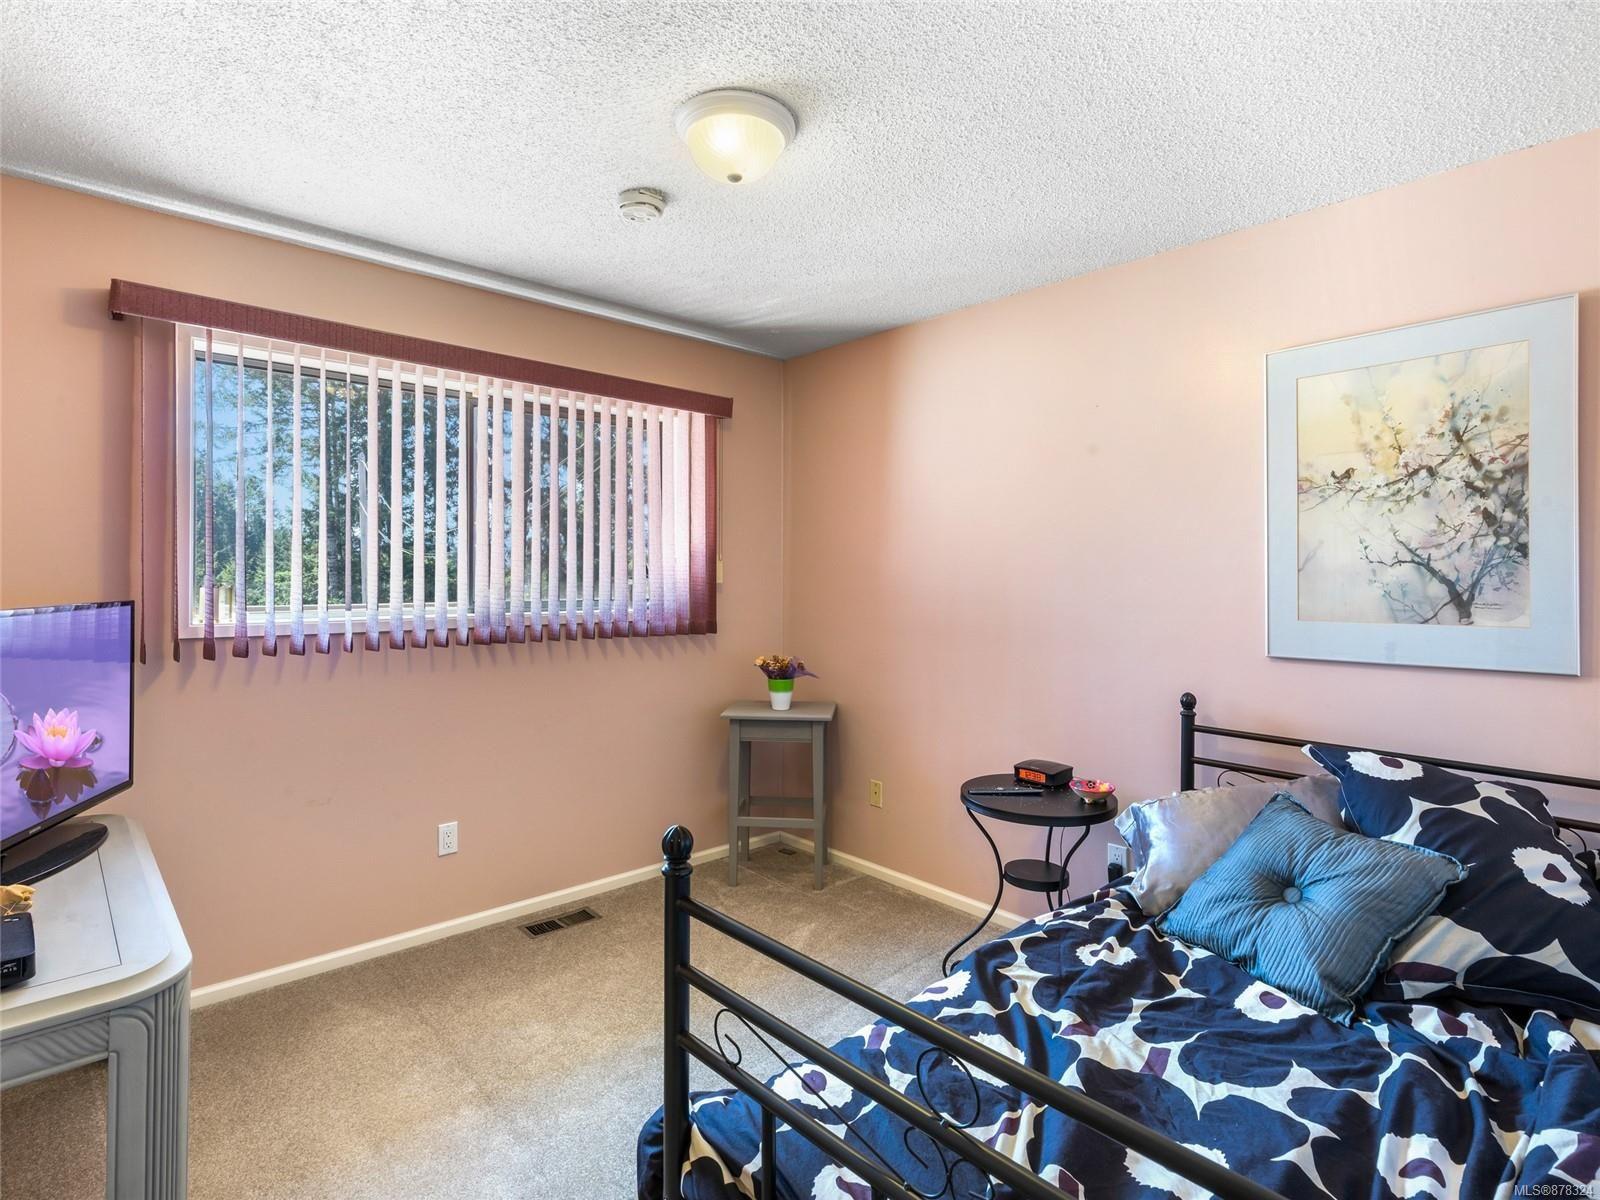 Photo 32: Photos: 3875 Moore Rd in : PA Port Alberni House for sale (Port Alberni)  : MLS®# 878324